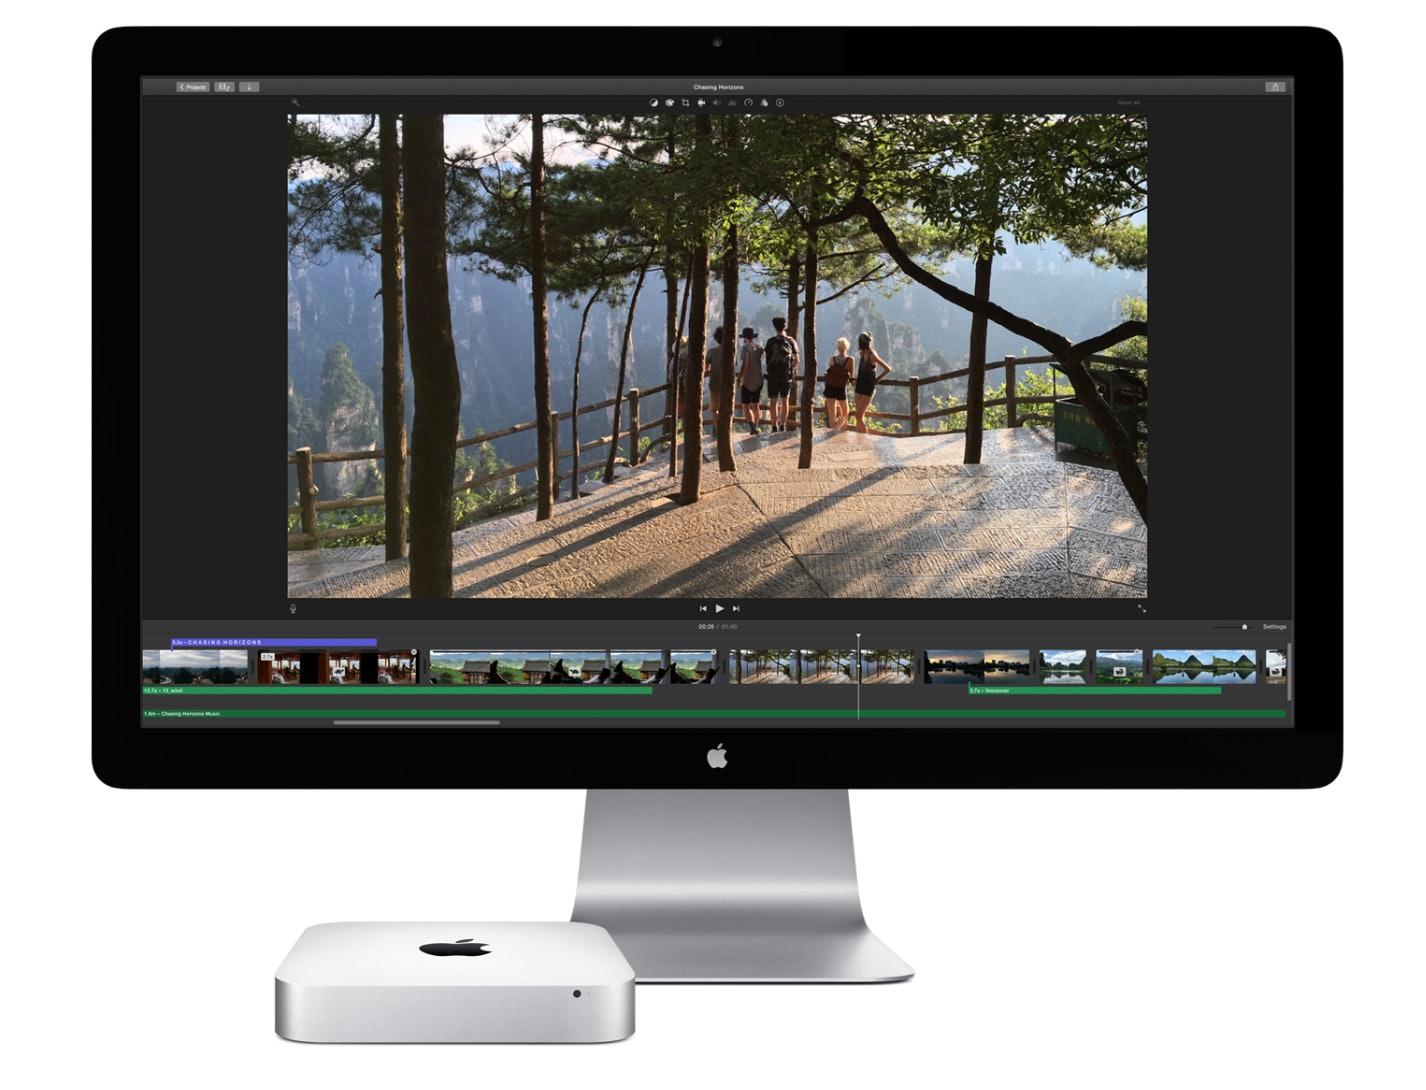 Mac Mini alongside an Apple display.